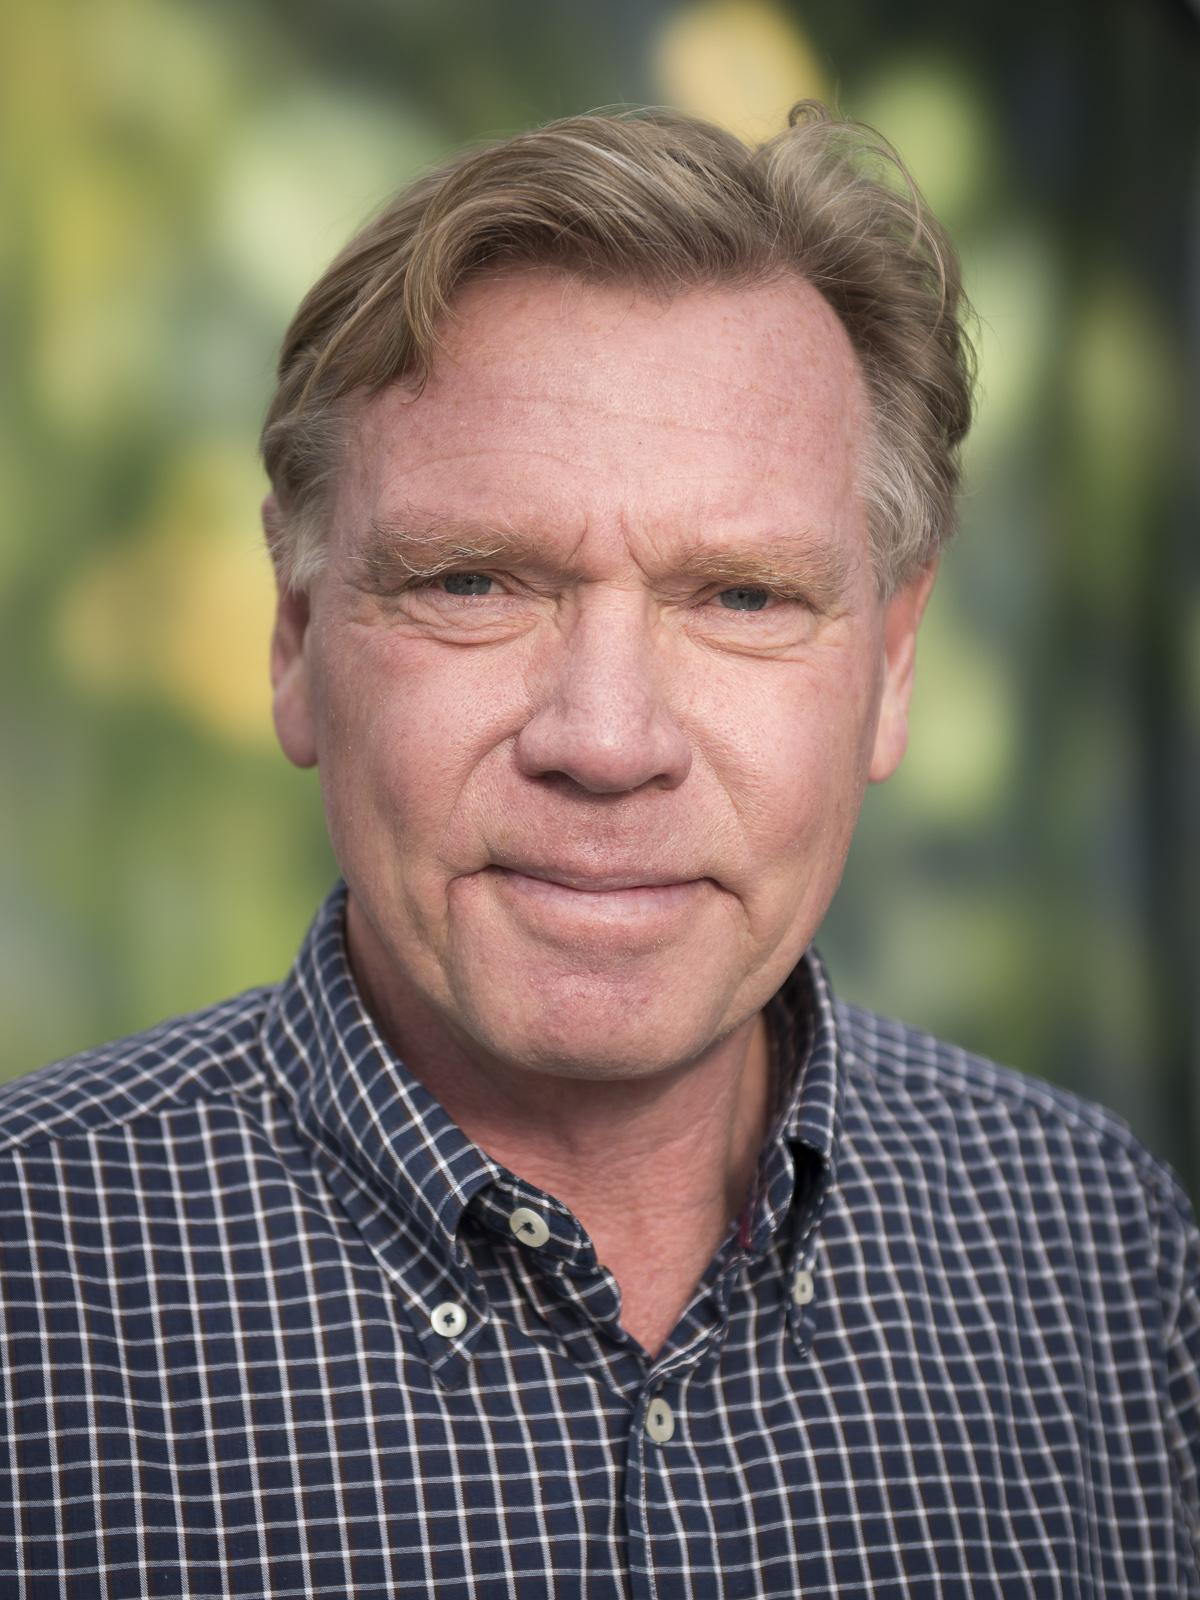 Bengt Andersson Gull - bengt-andersson-gull